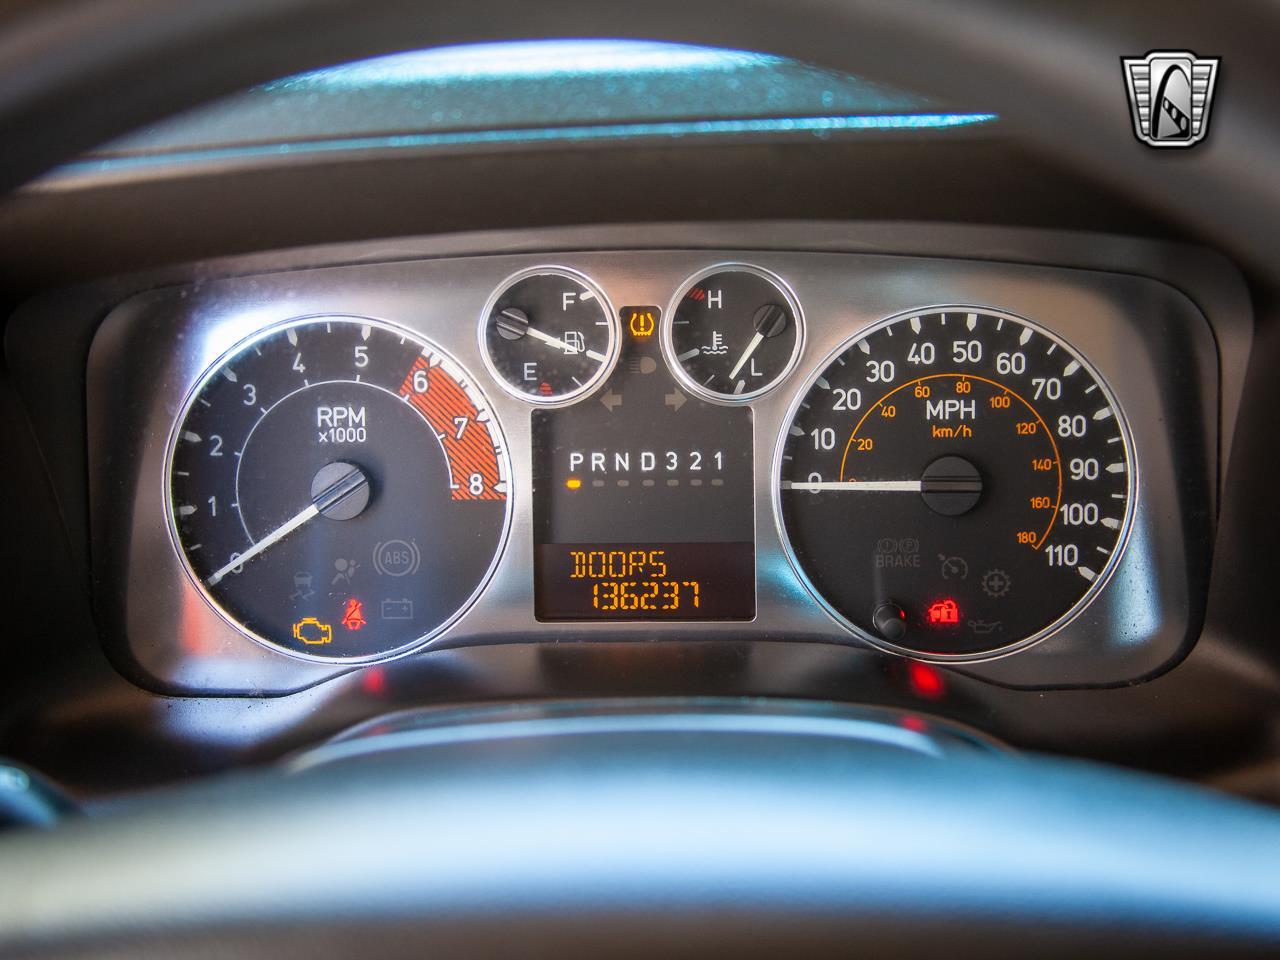 2009 Hummer H3 (CC-1378870) for sale in O'Fallon, Illinois